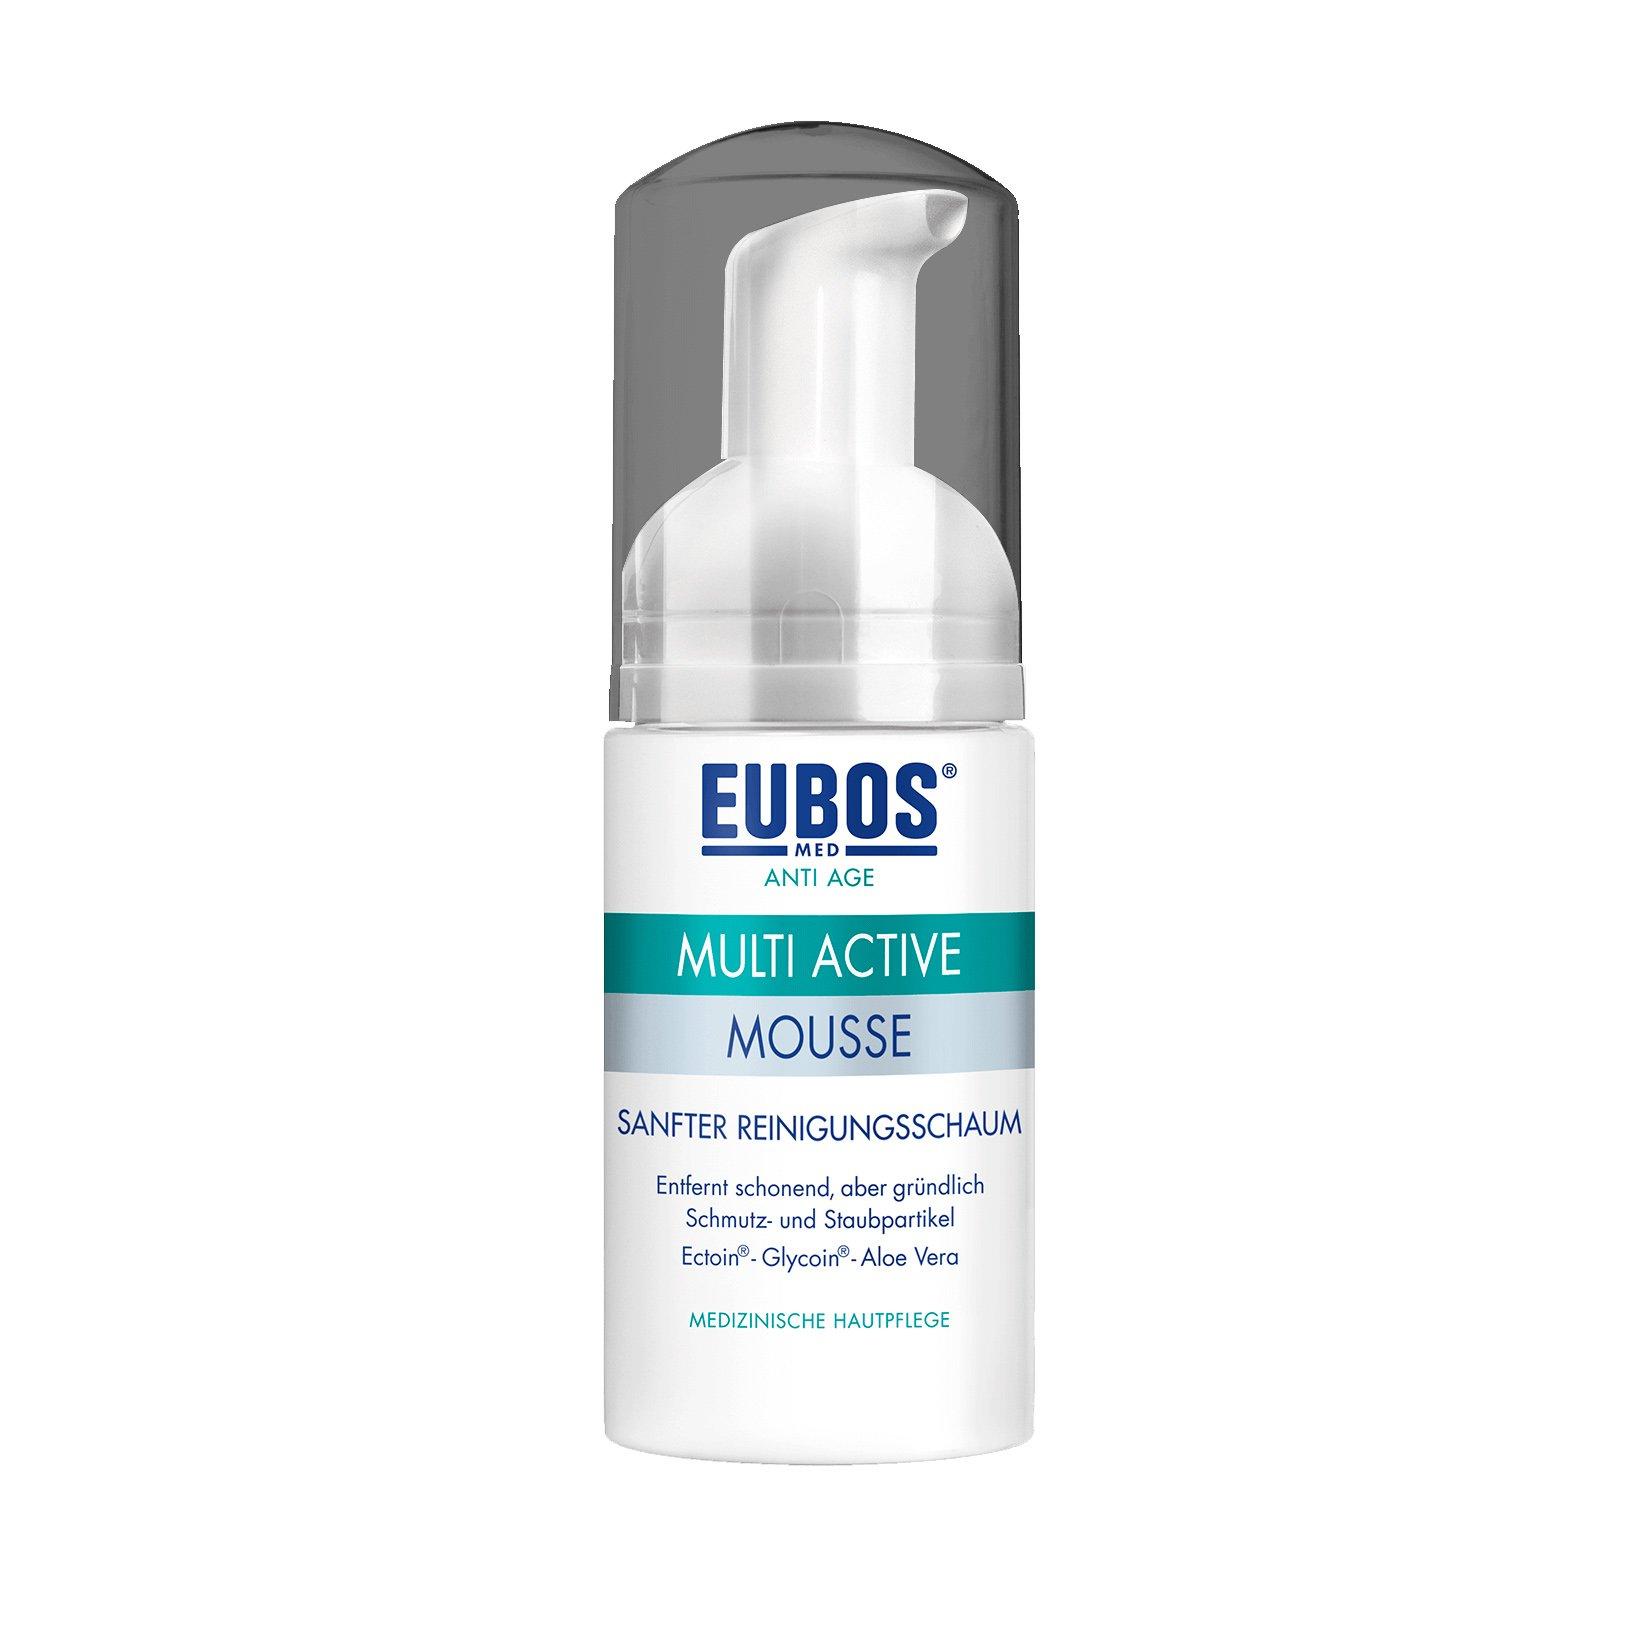 Eubos Multi Active Mousse Mild Cleansing Foam Απαλός Αφρός Καθαρισμού Προσώπου 100ml